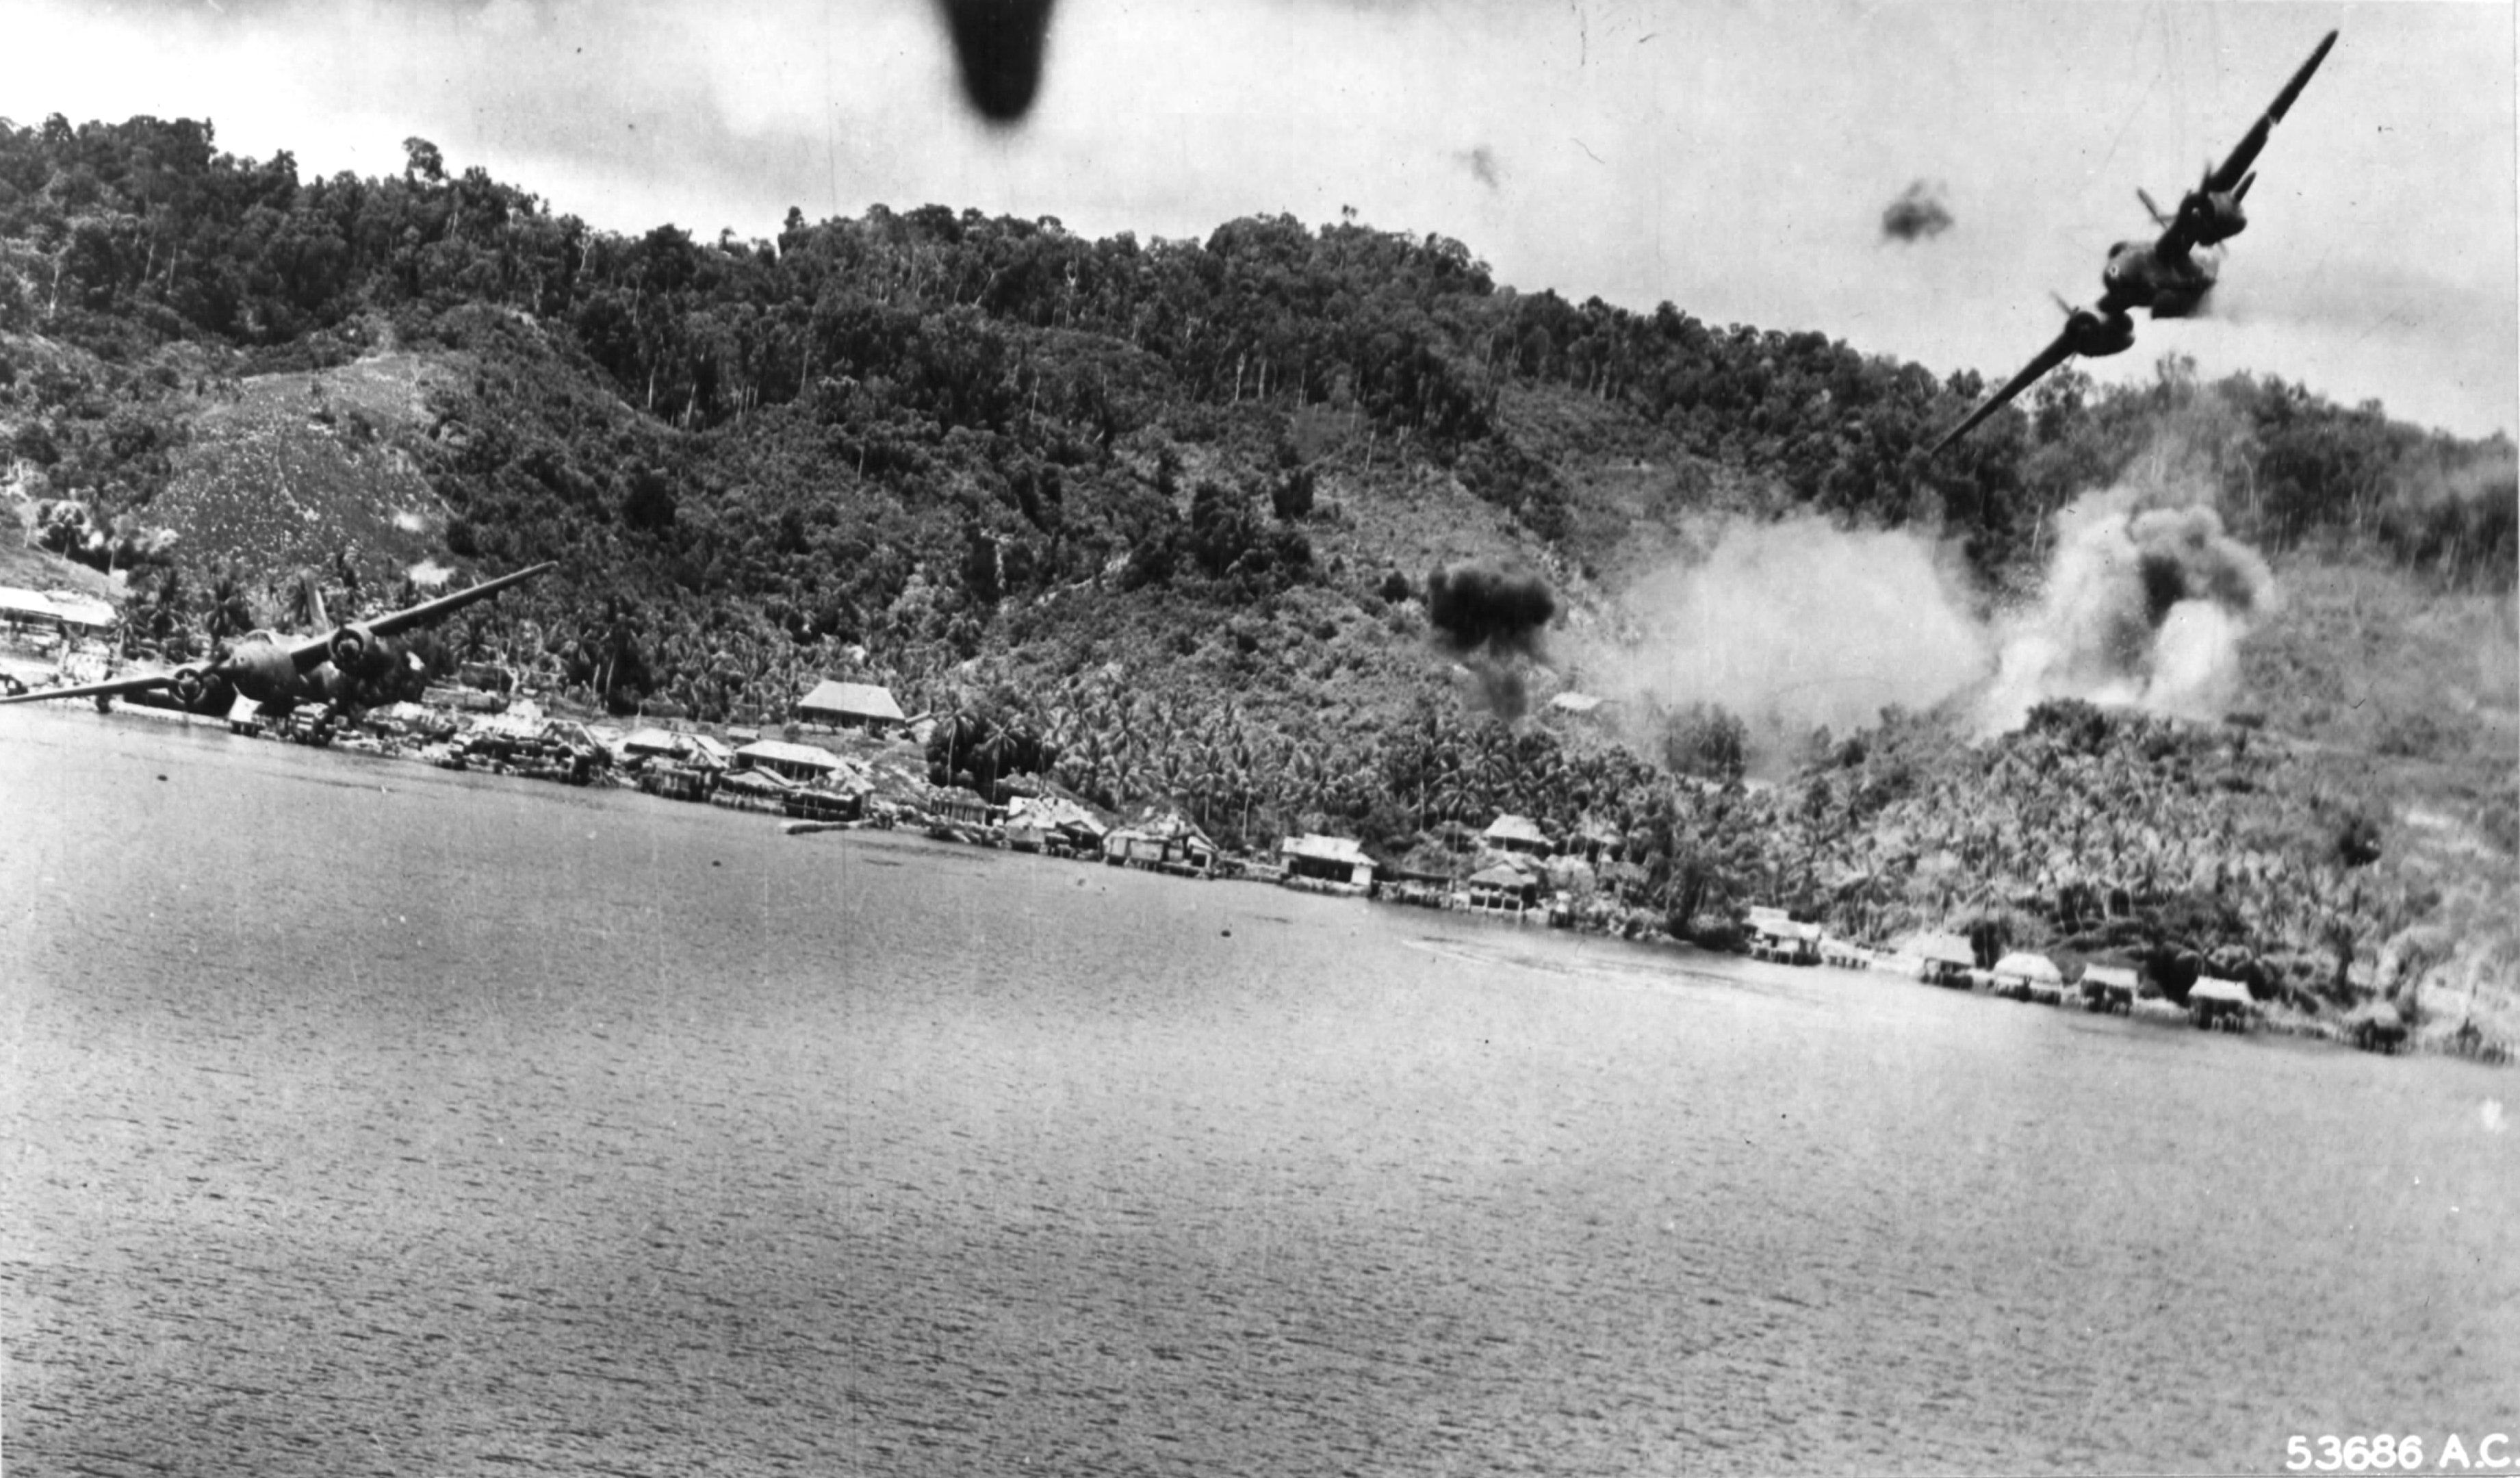 Douglas-A-20-G-25-DO-Havoc-43-9432-Bevo-22-July-1944-photo-1.jpg